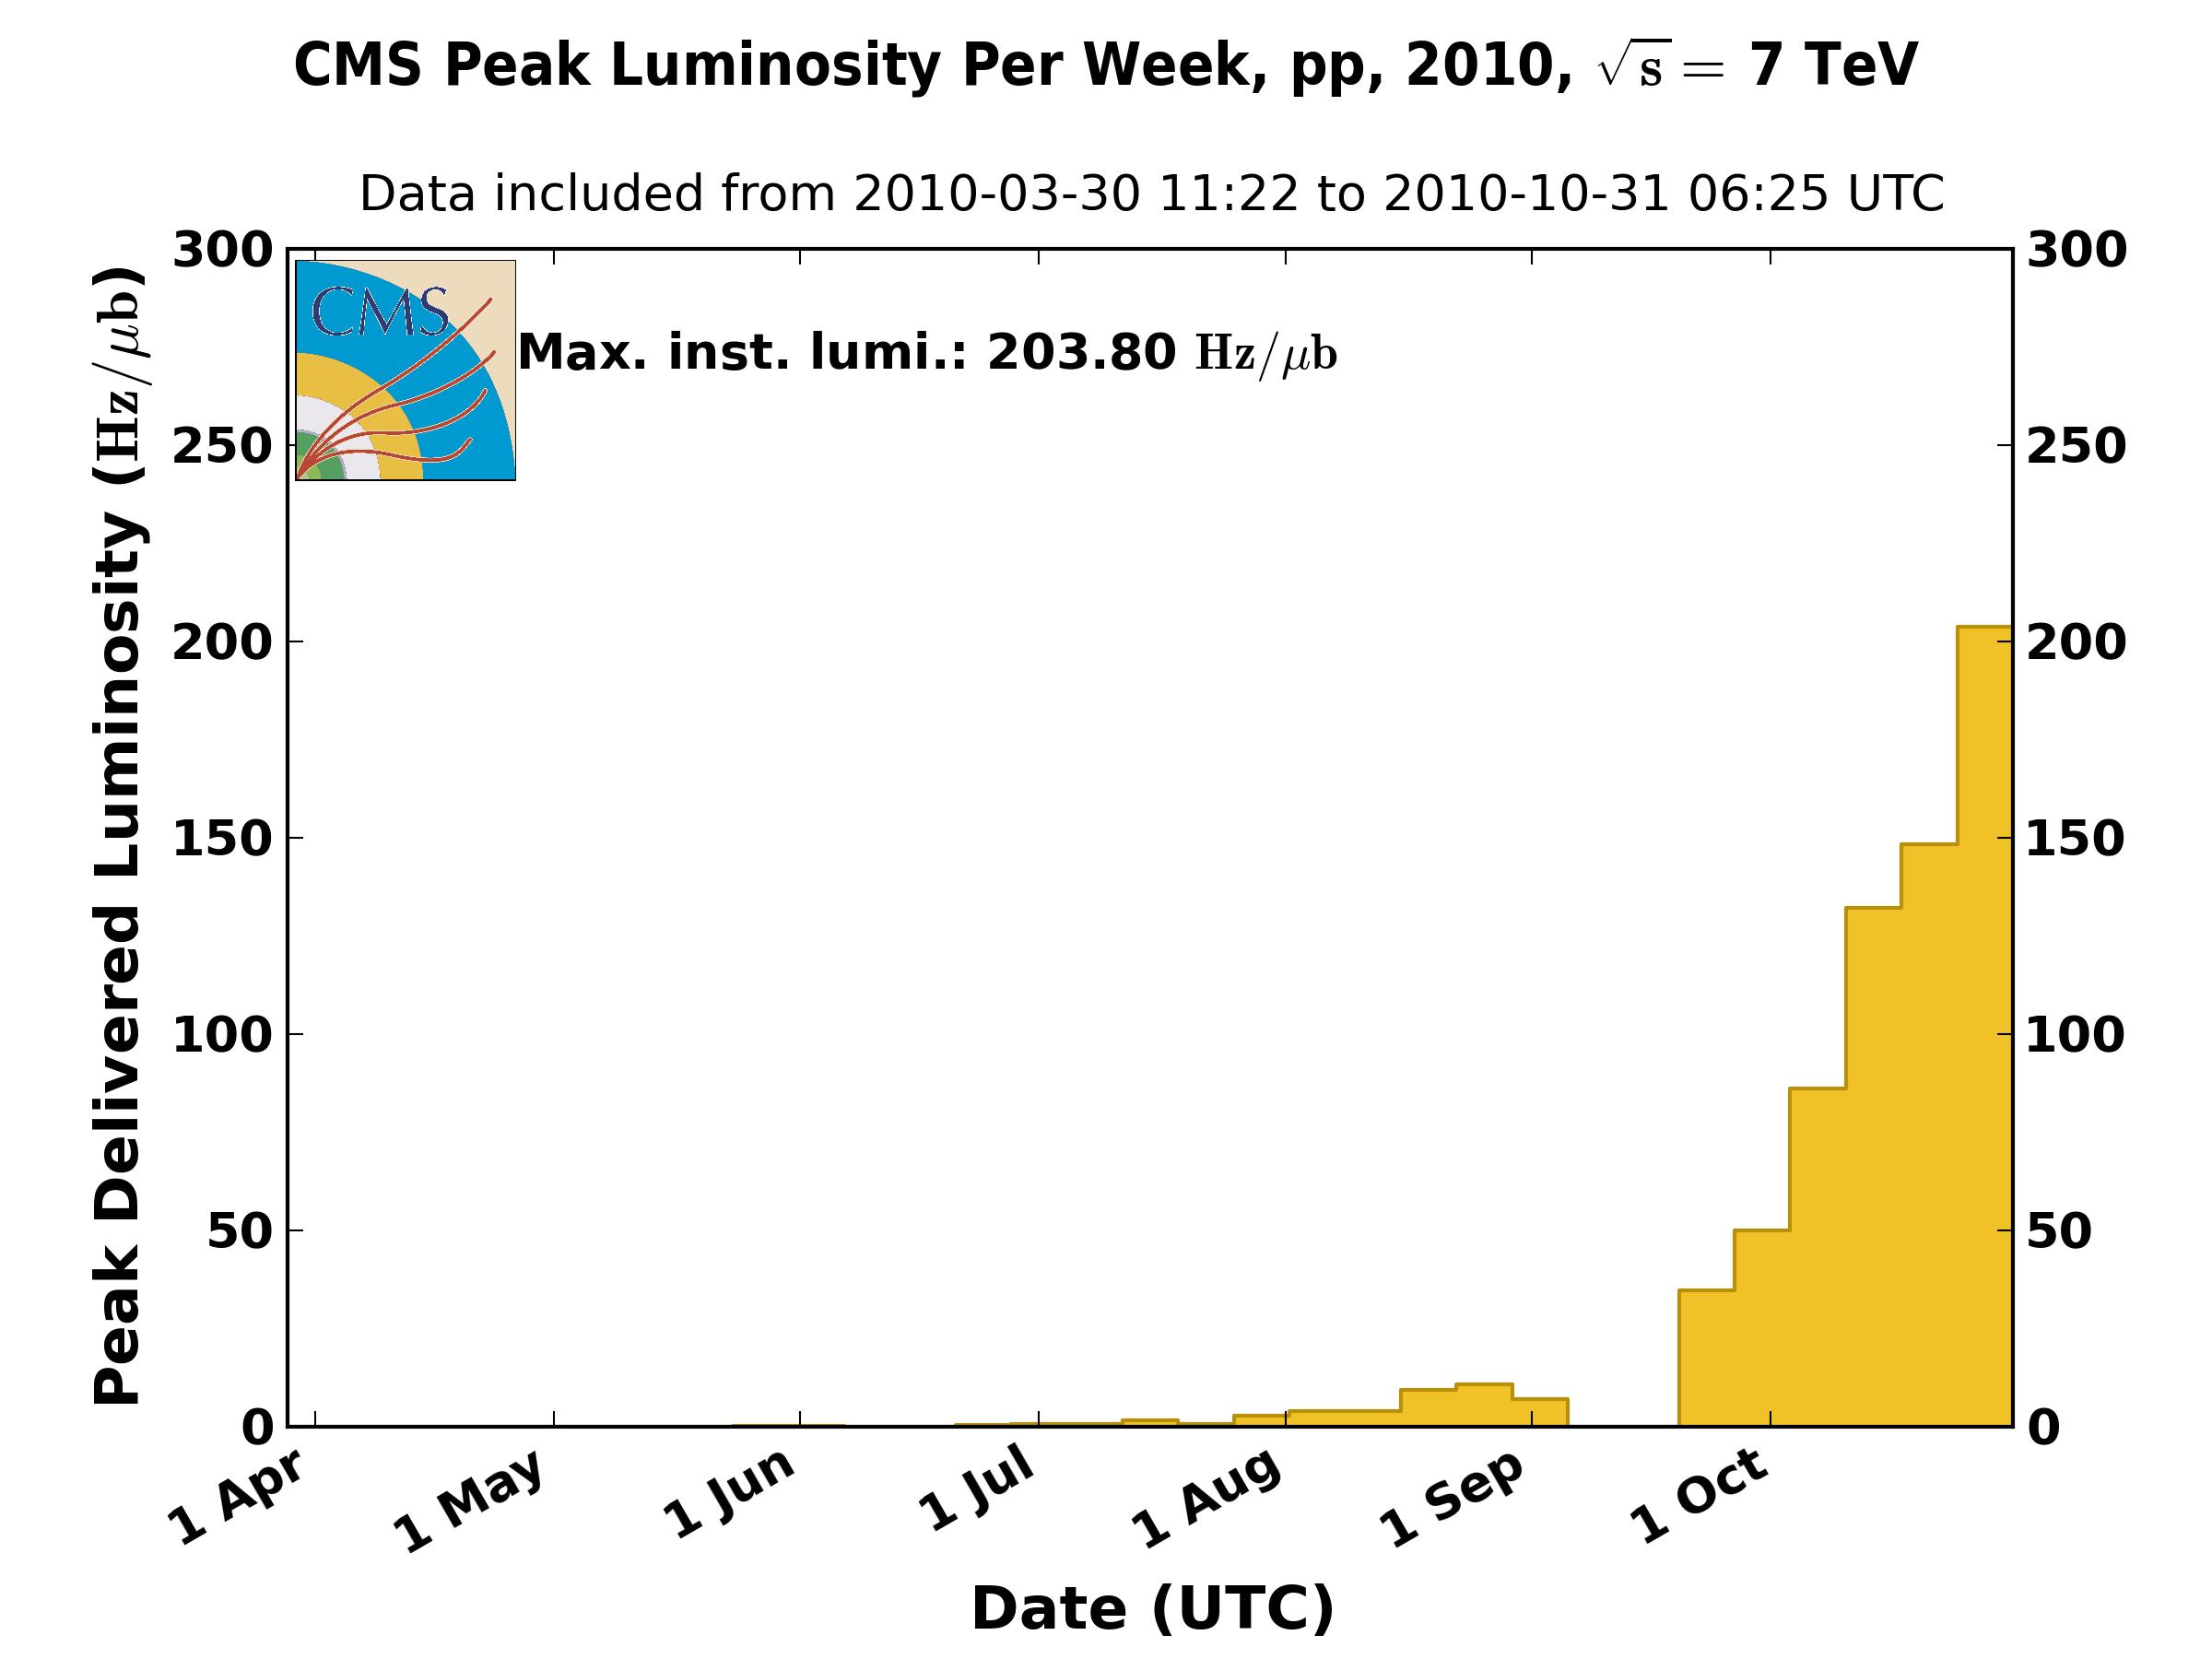 https://cern.ch/cmslumi/publicplots/peak_lumi_per_week_pp_2010.png